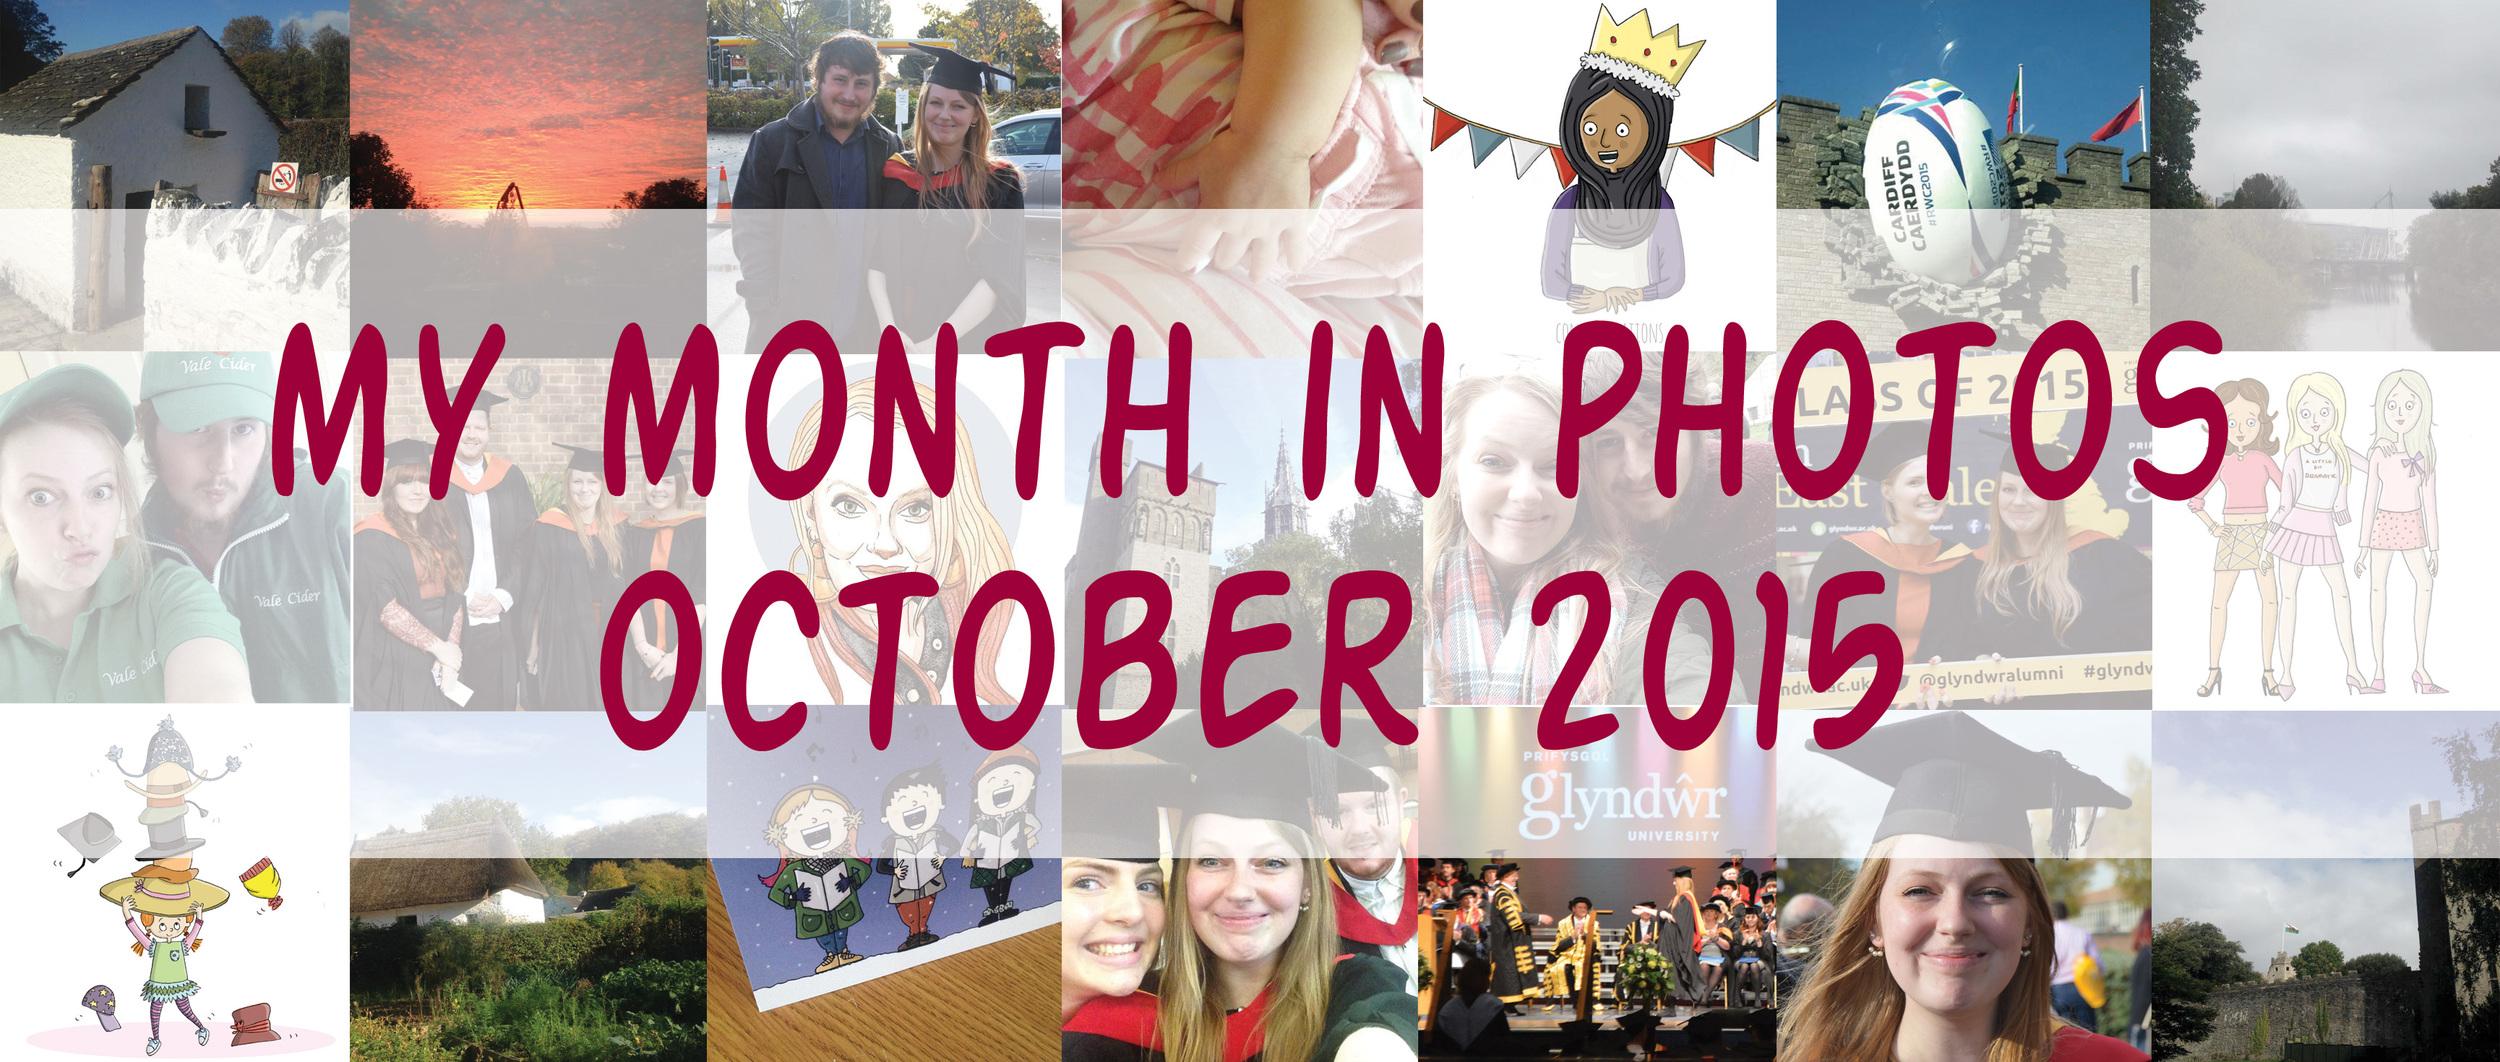 month photos oct 2015